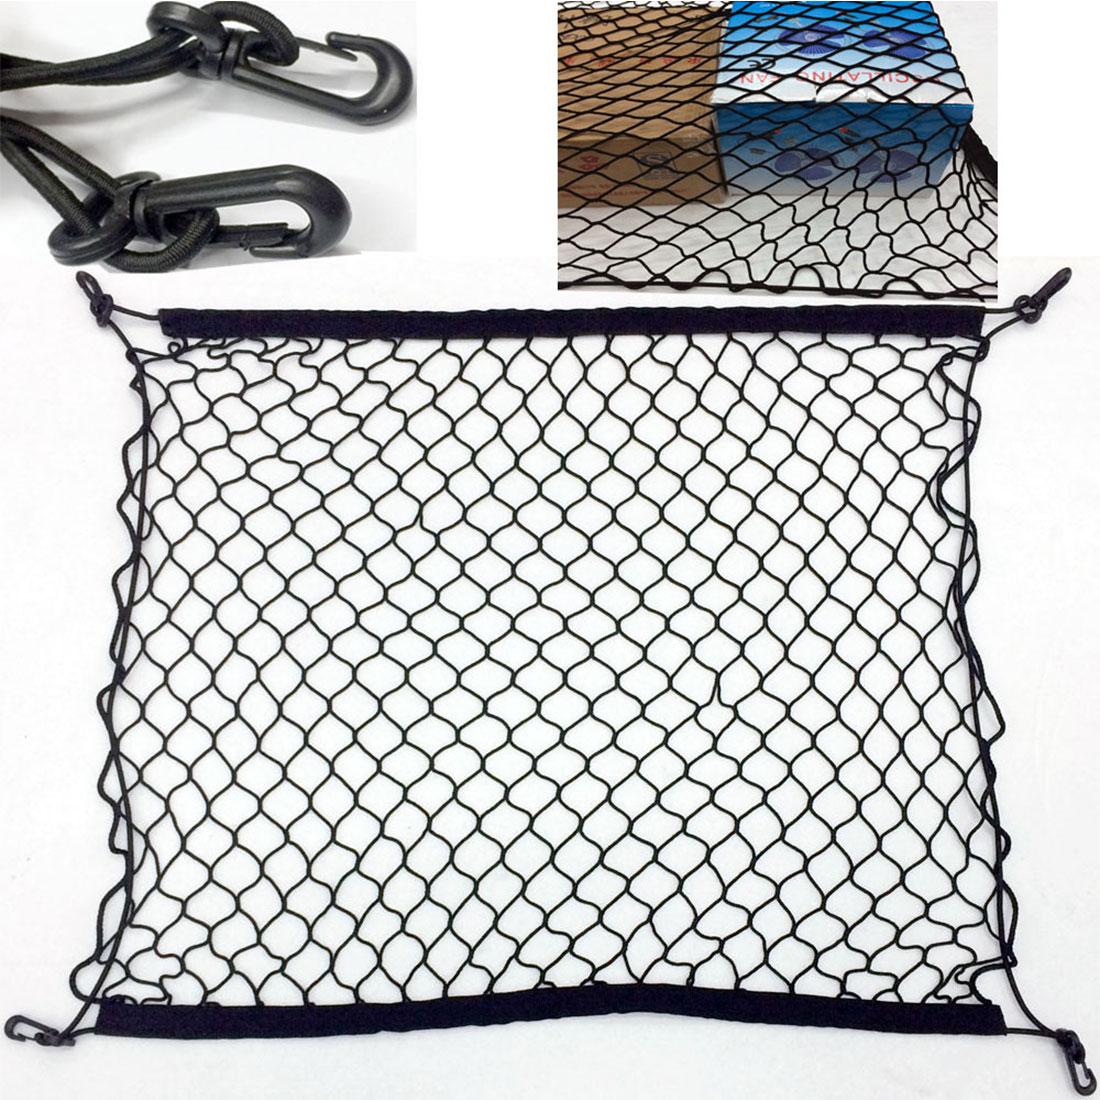 70 X 70cm Auto Care  Car Trunk Luggage Storage Cargo Organiser Nylon Elastic Mesh Net With 4 Plastic Hooks  Dewtreetali